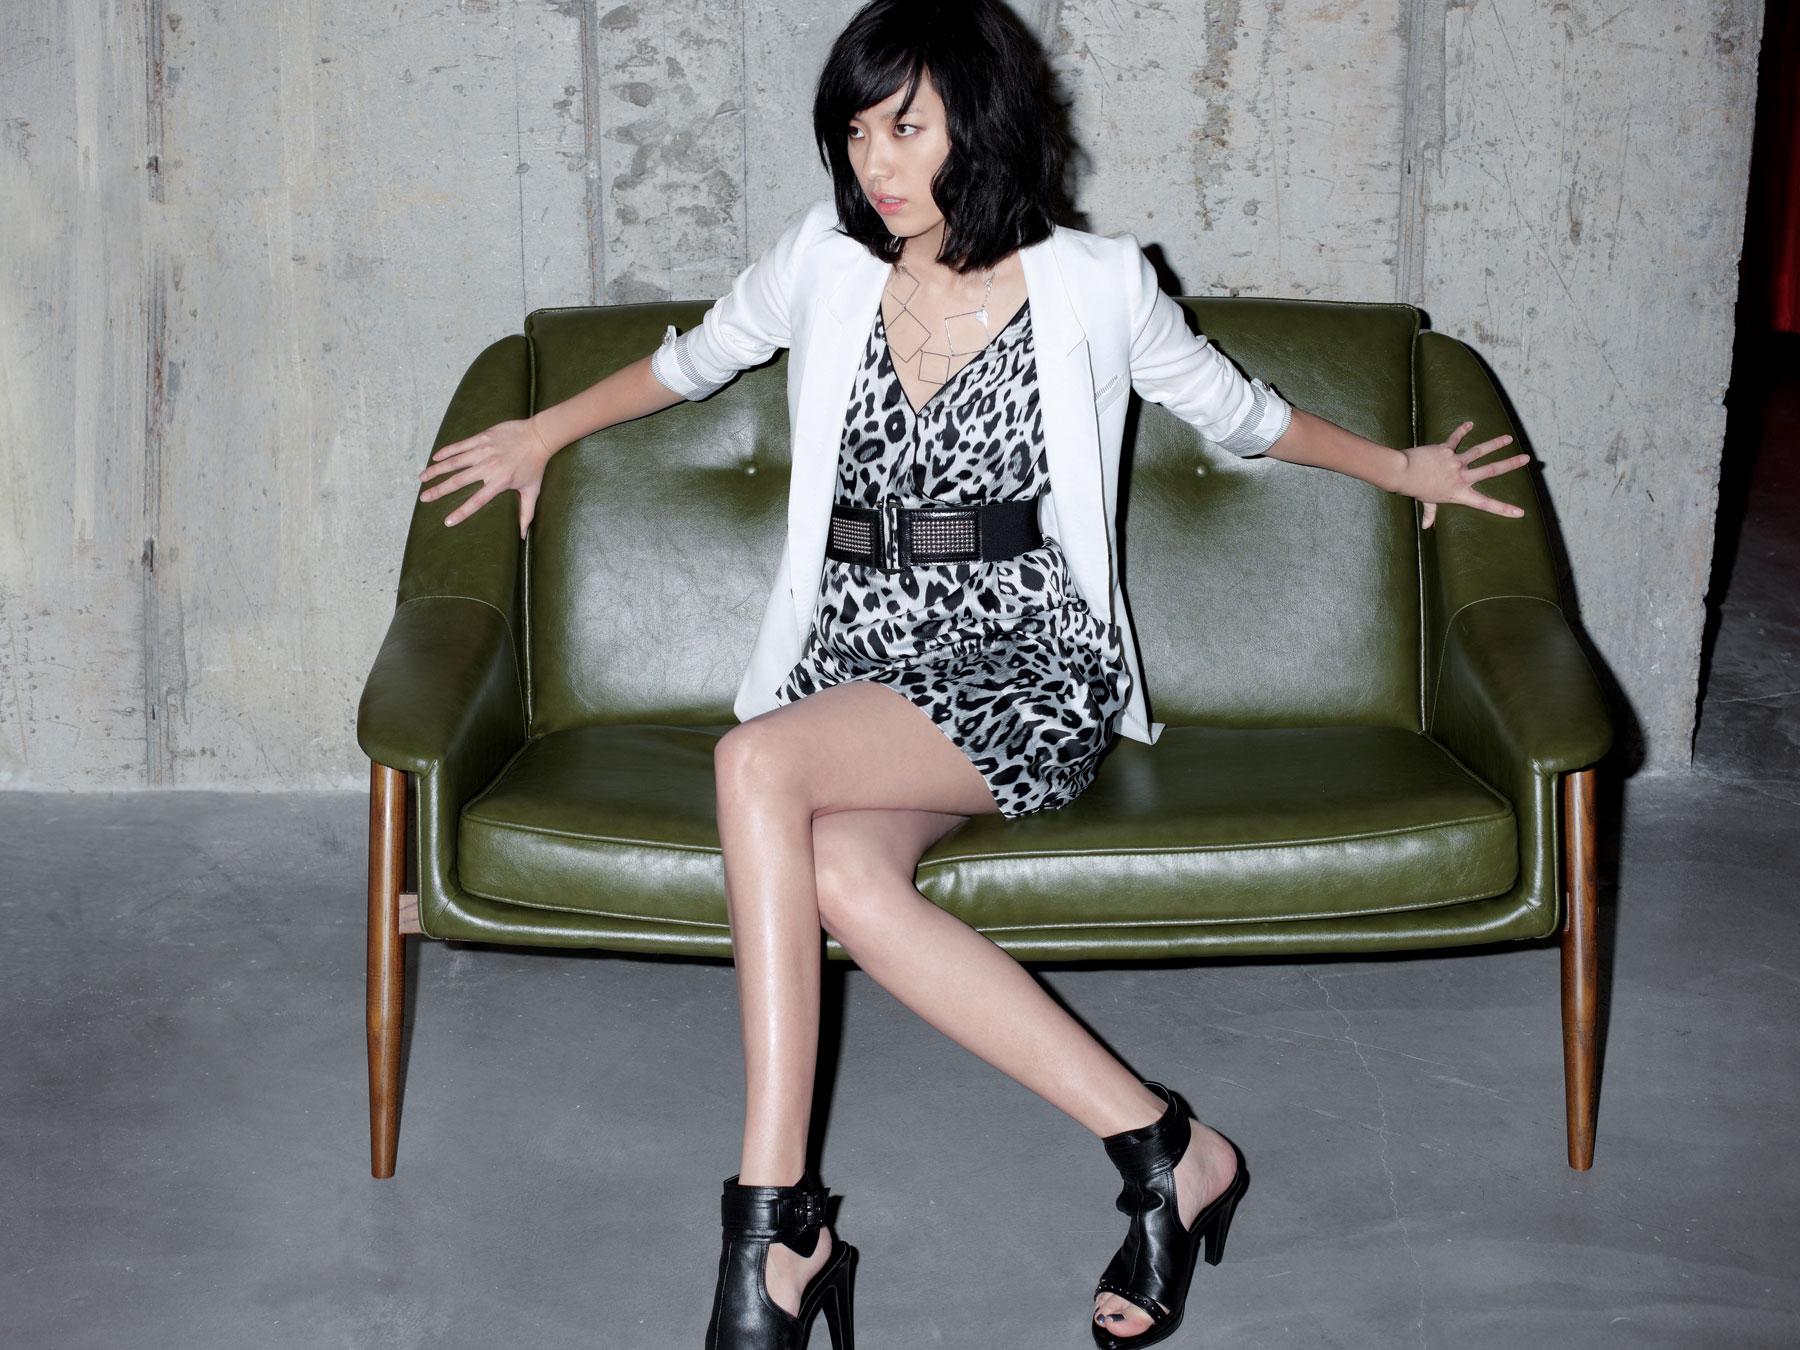 Feet Han Sung Joo nude (99 photo), Pussy, Paparazzi, Feet, butt 2019